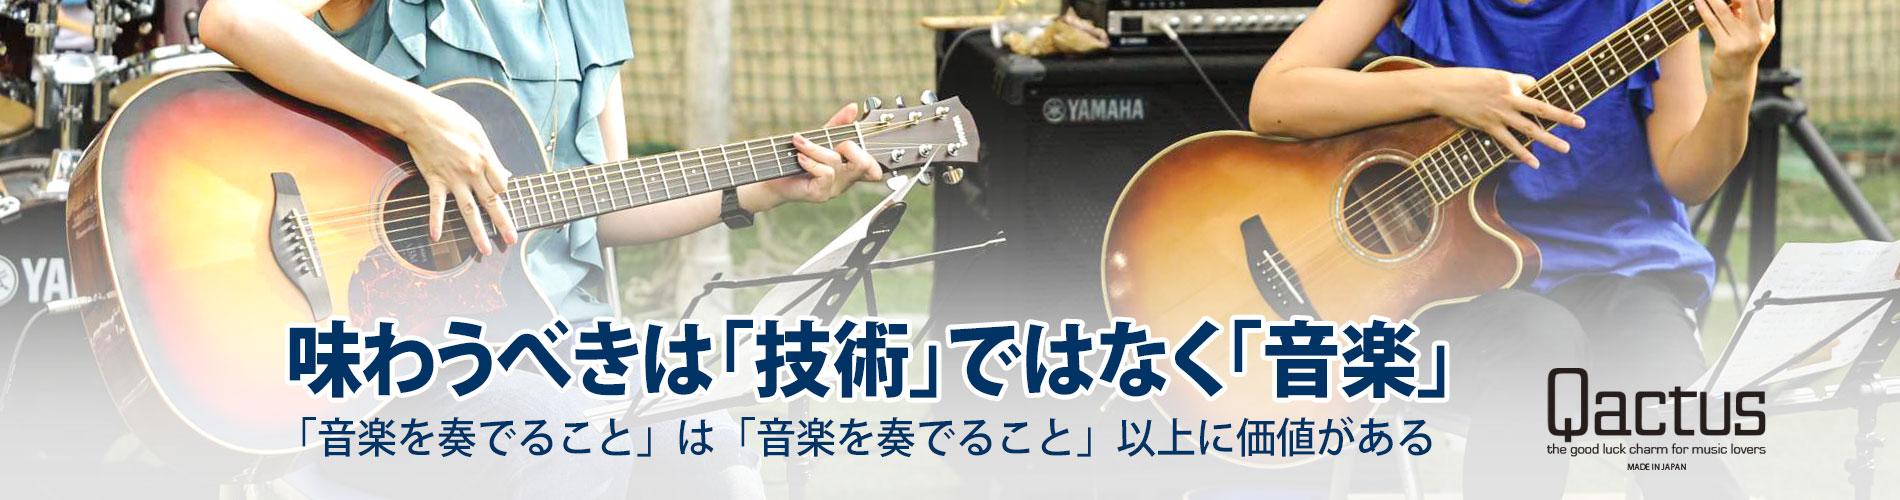 【Qactus-カクタス】ギター挫折者をゼロにする新発明